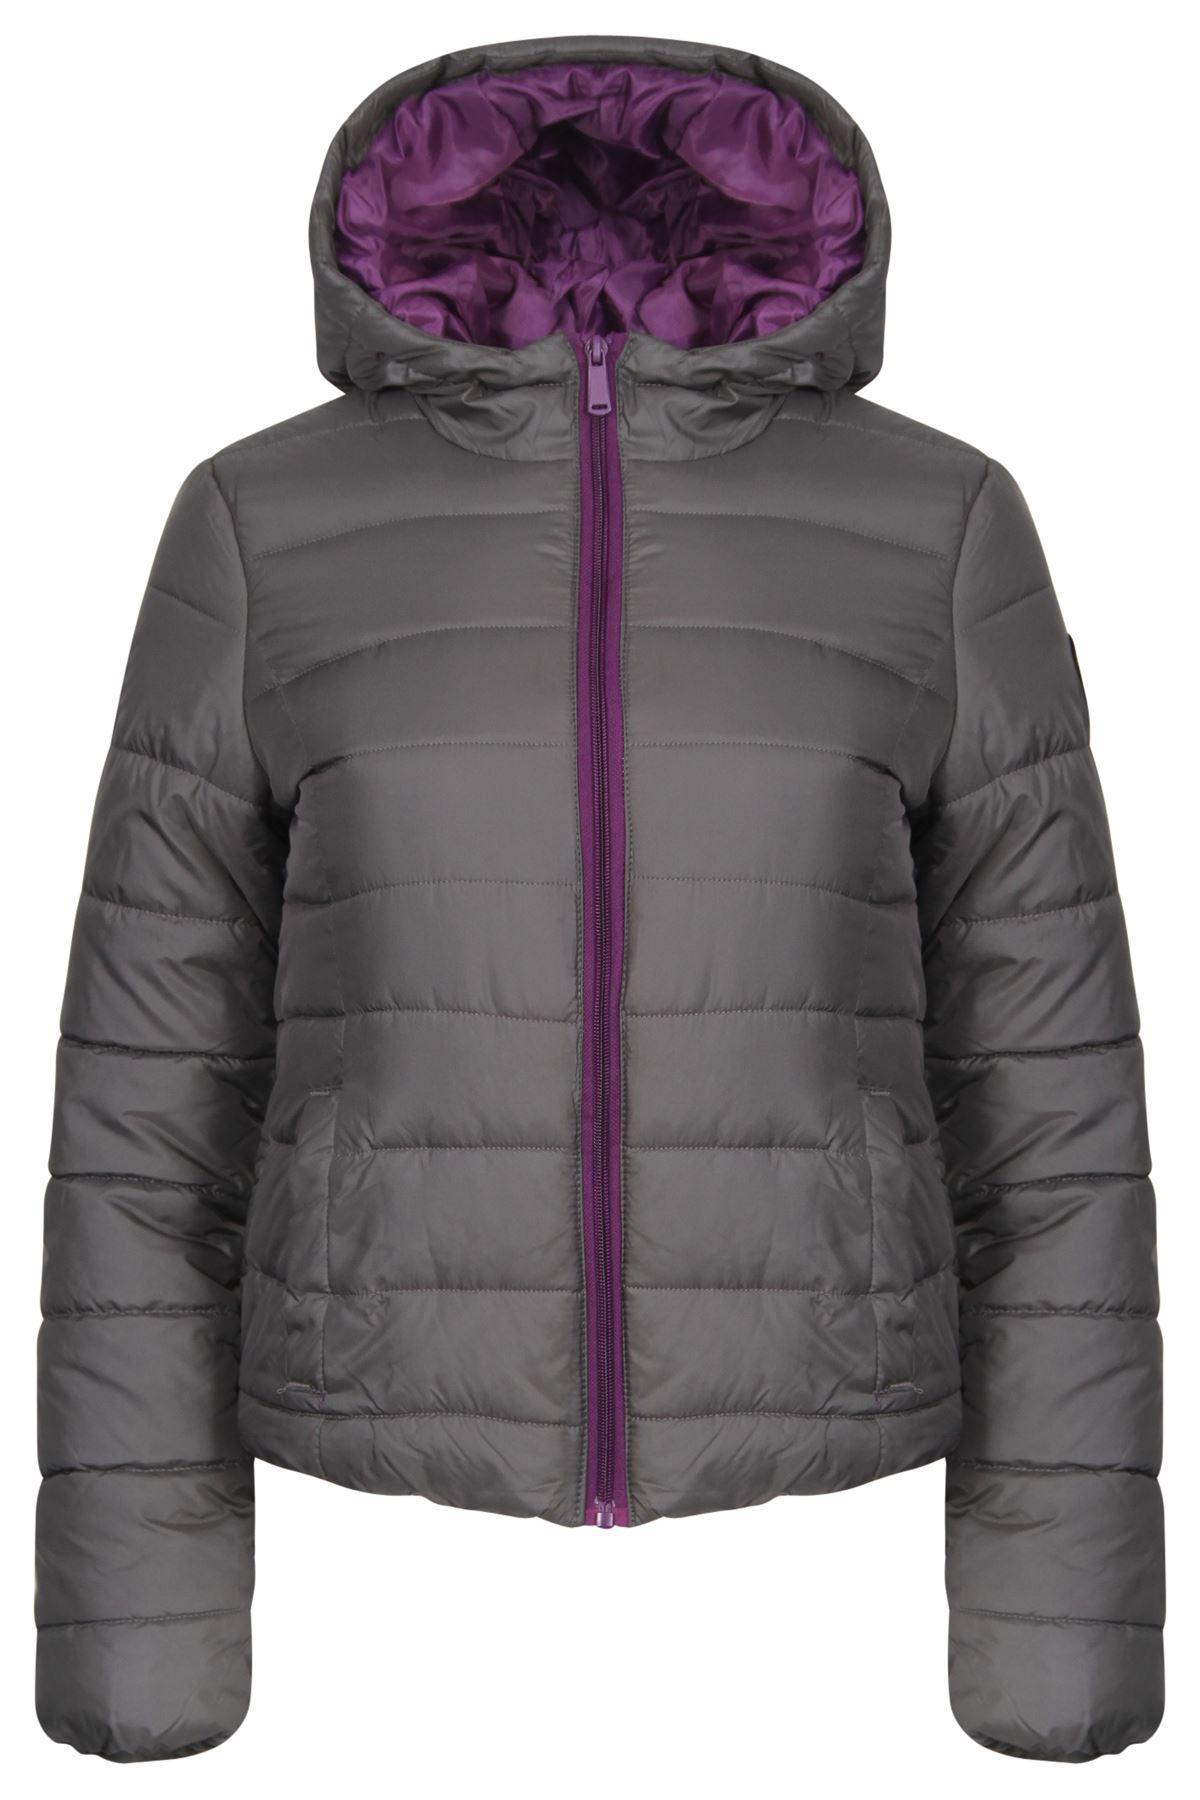 Womens padded coats with hood